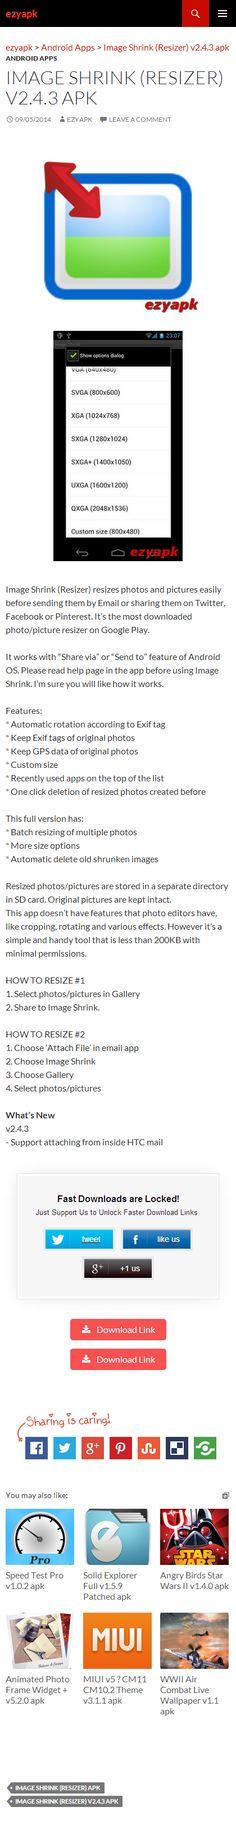 Android Apps Image Shrink (Resizer) v2.4.3 apk - ezyapk Image Shrink (Resizer) resizes photos and pictures easily before sending them by Email or sharing them on Twitter, Facebook or Pinterest. Most downloaded. http://www.ezyapk.com/android-apps/image-shrink-resizer-v2-4-3-apk/